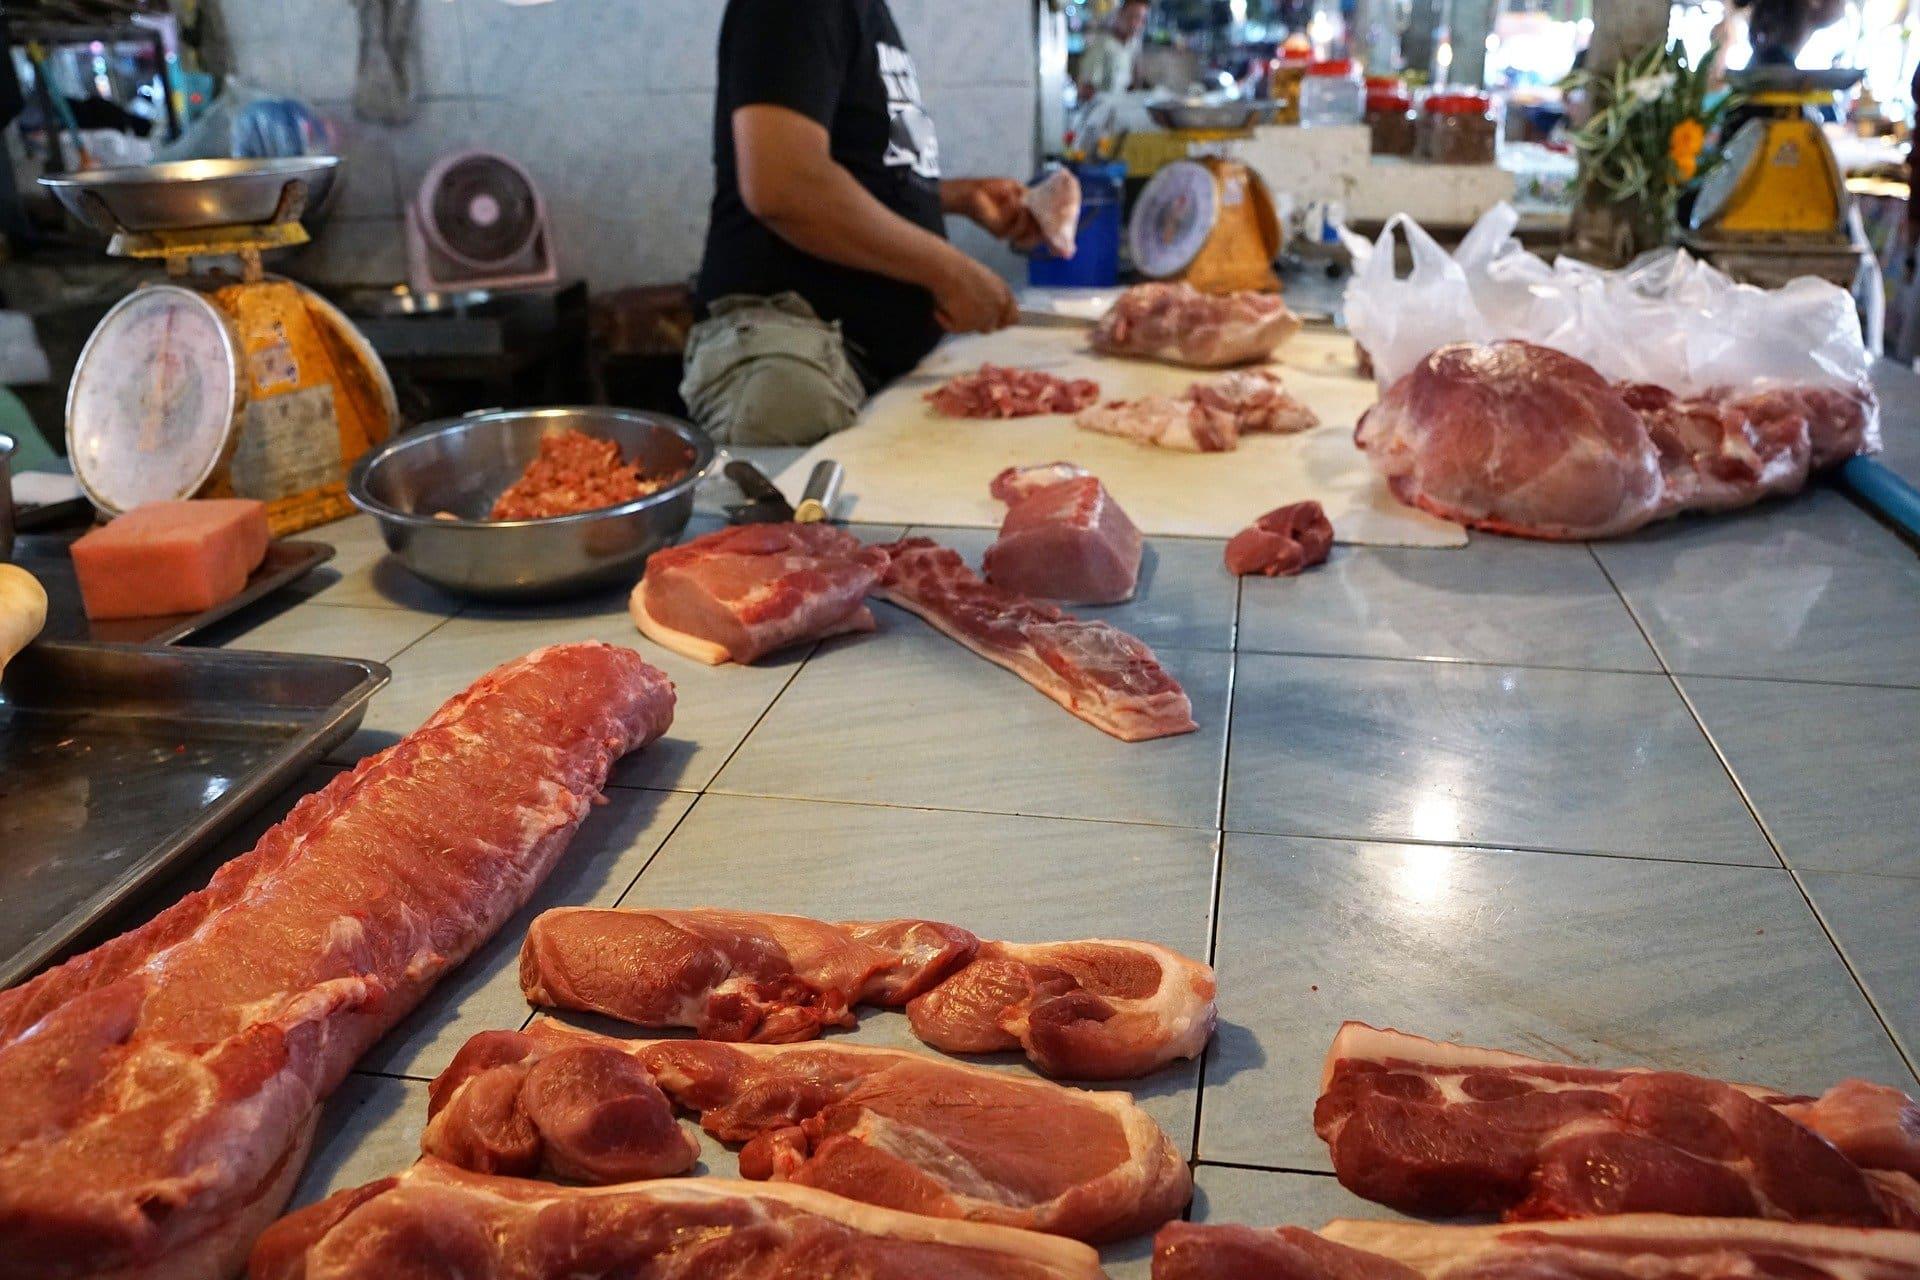 Profitable butchery business